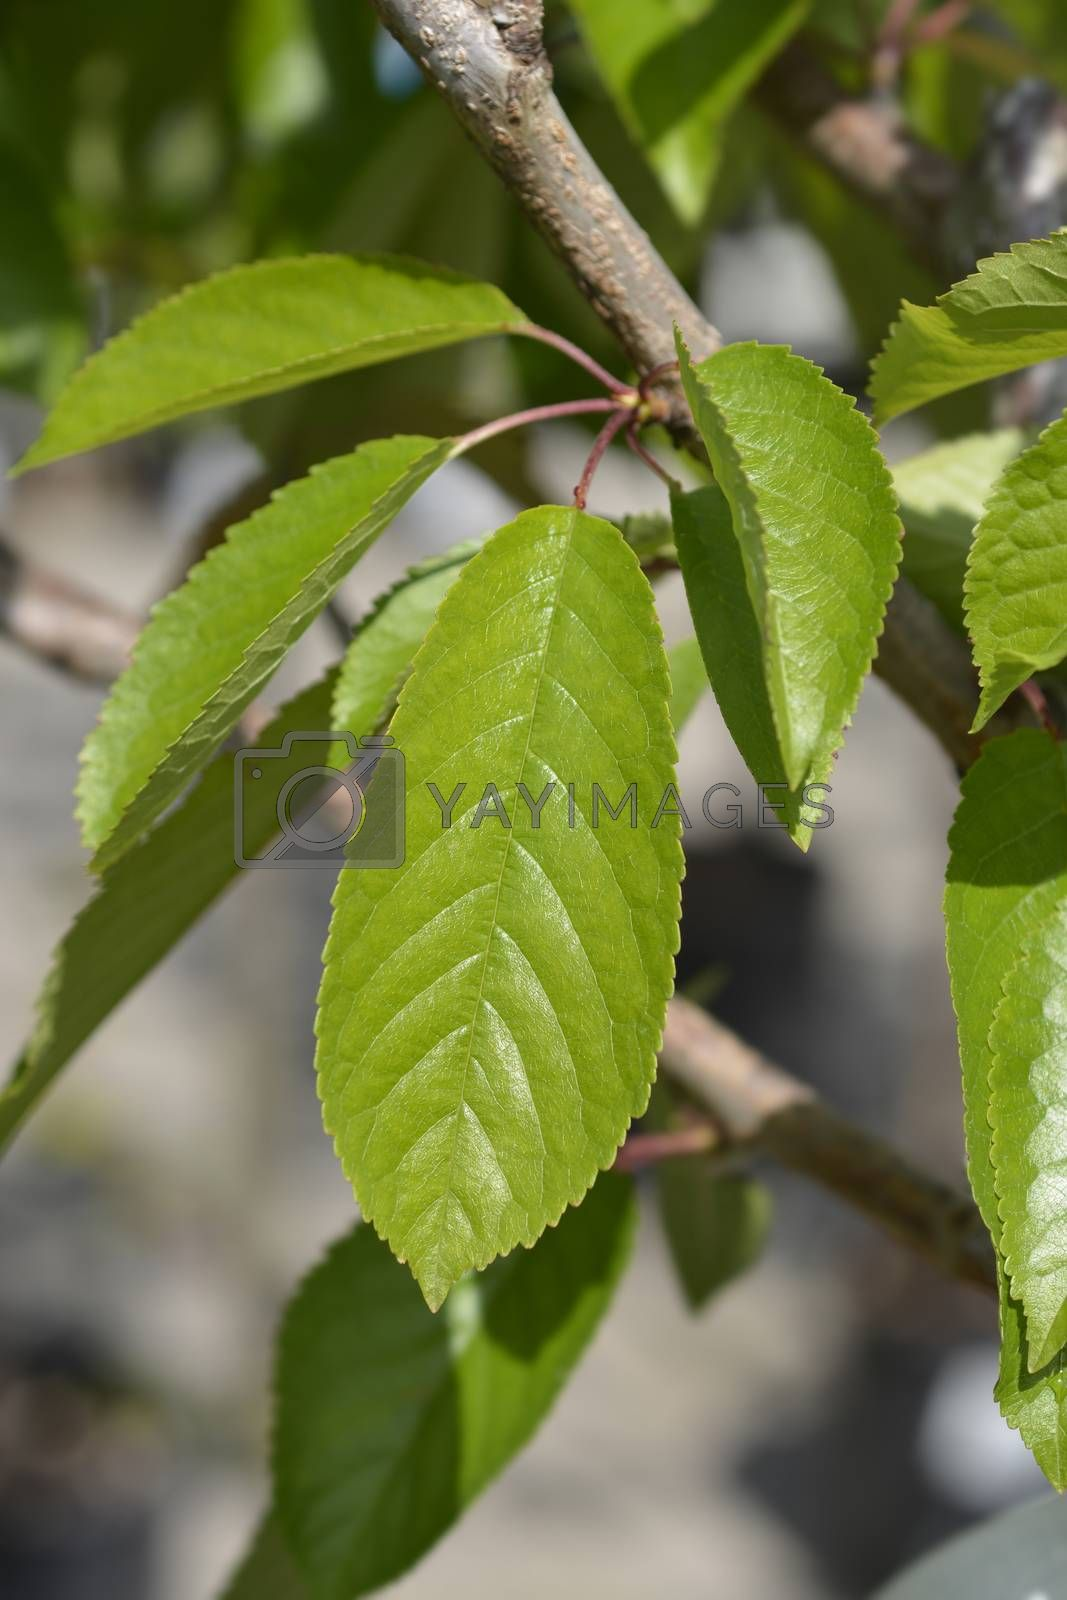 Sweet cherry tree Bigarreau Napoleon leaves - Latin name - Prunus avium Bigarreau Napoleon